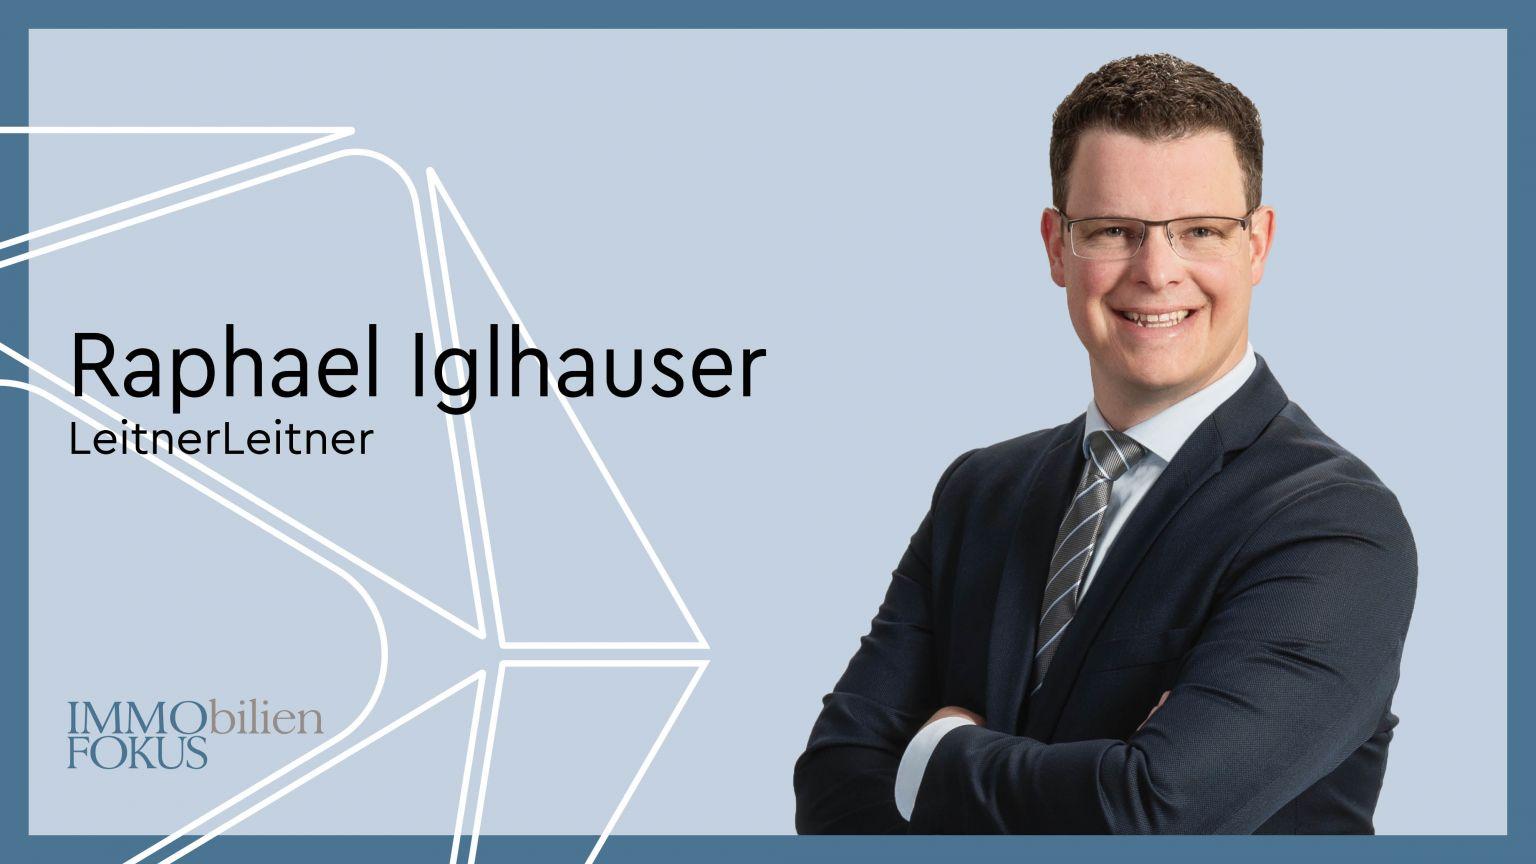 Raphael Iglhauser ist neuer Director bei LeitnerLeitner